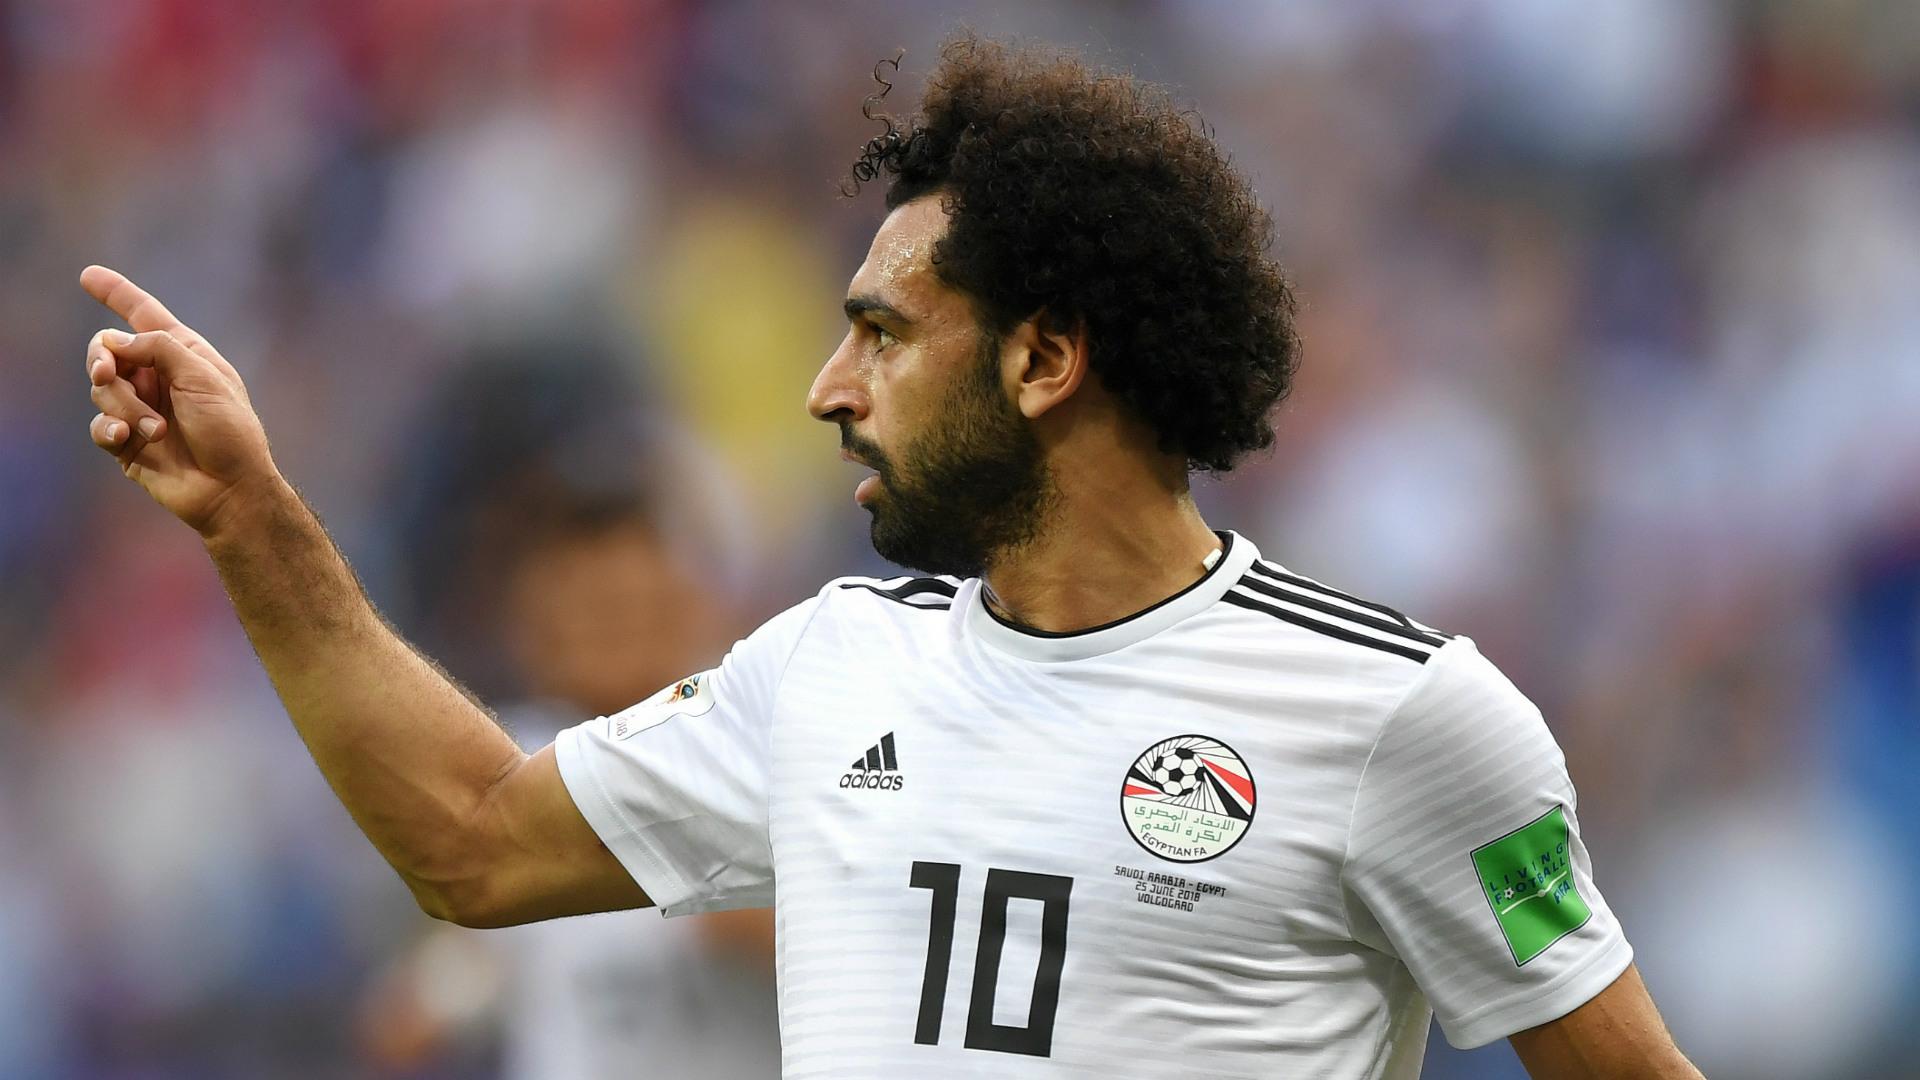 arabie saoudite v  u00c9gypte r u00e9sum u00e9 du match  25  06  2018